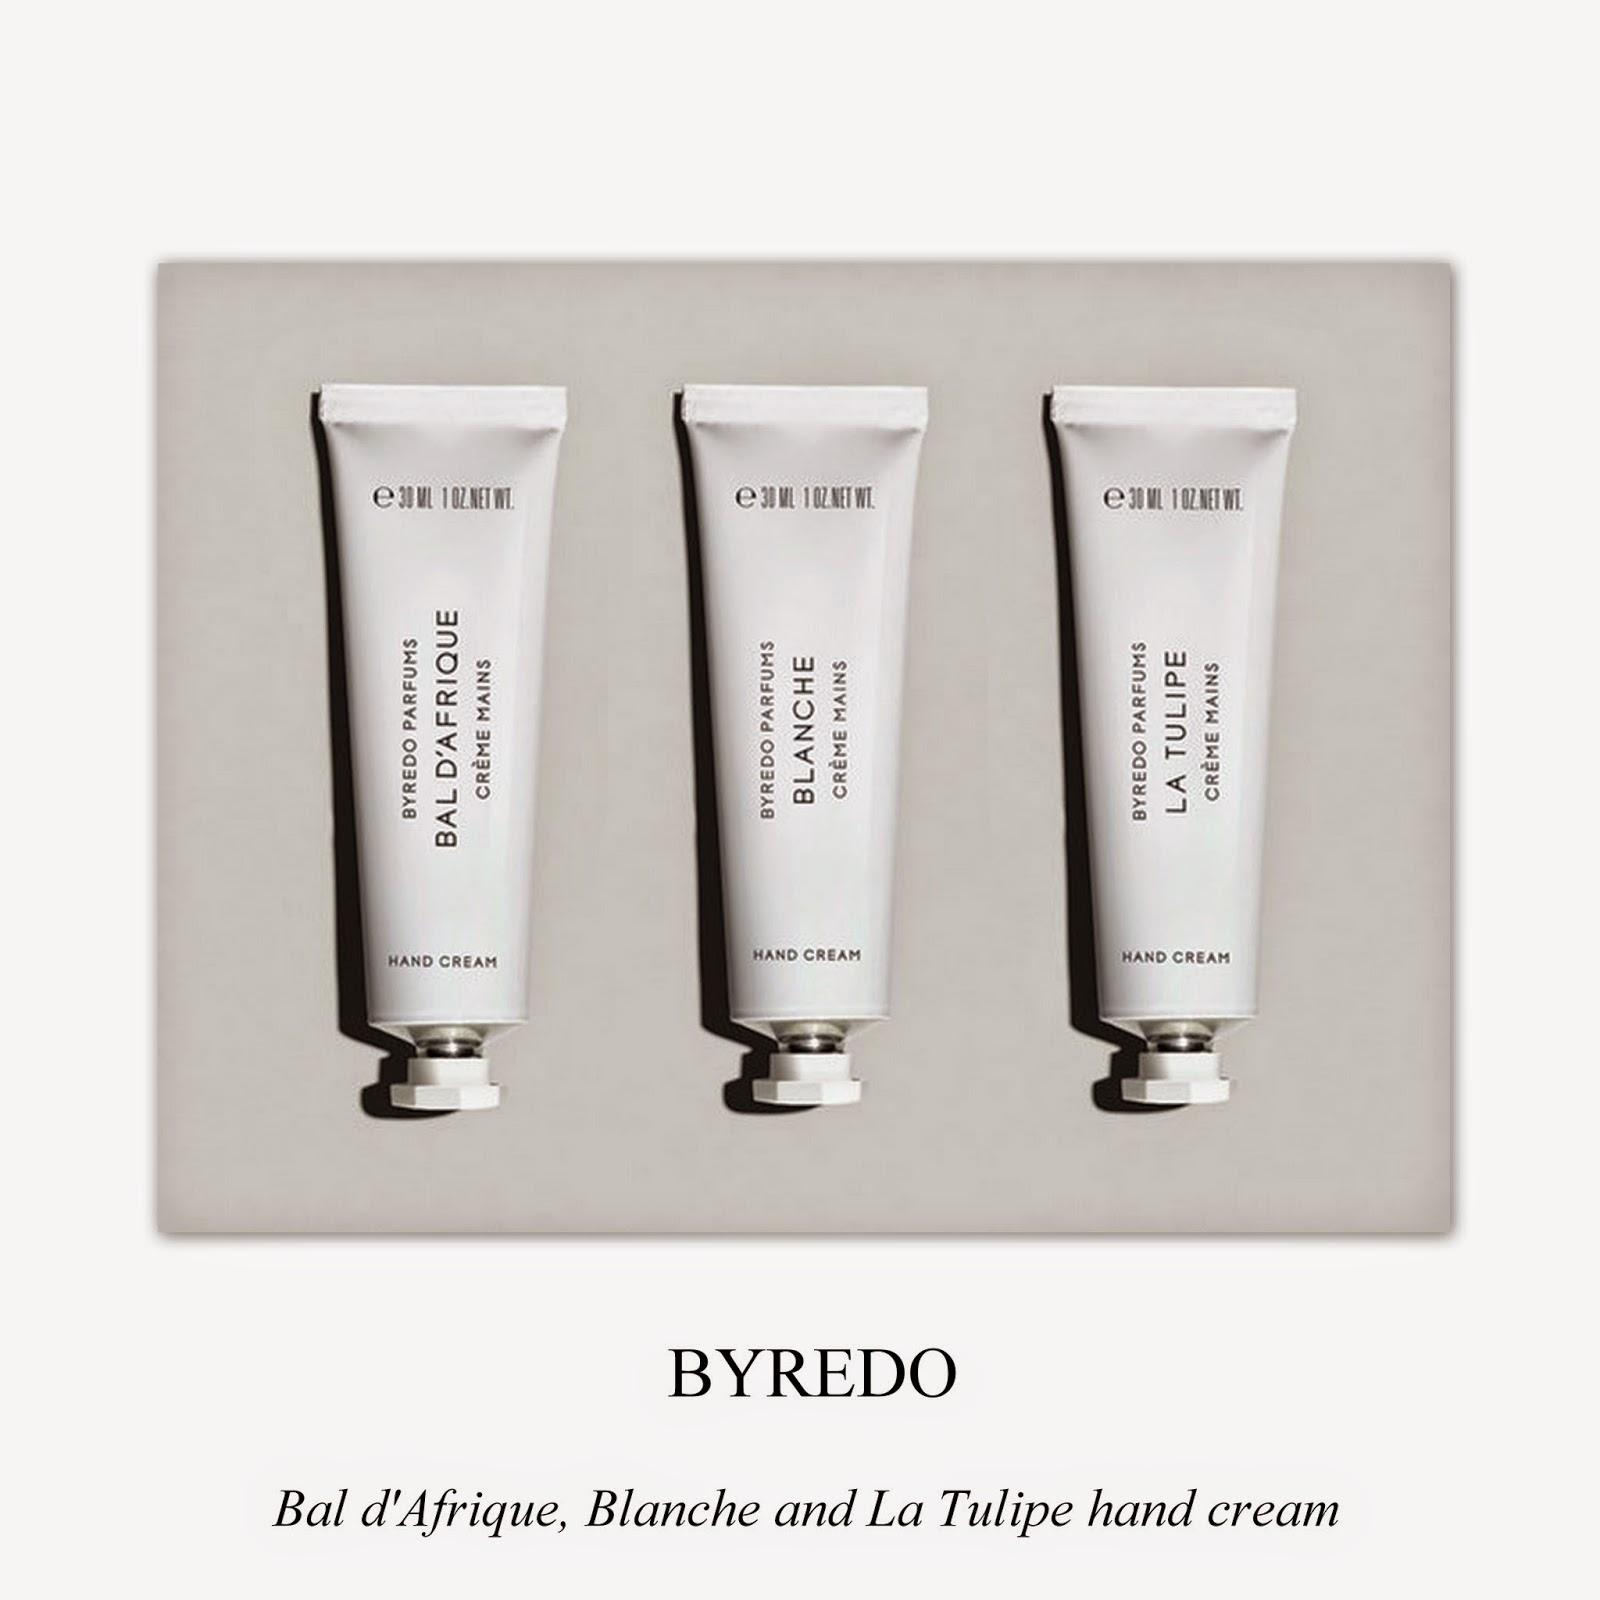 Hand creams from Byredo.